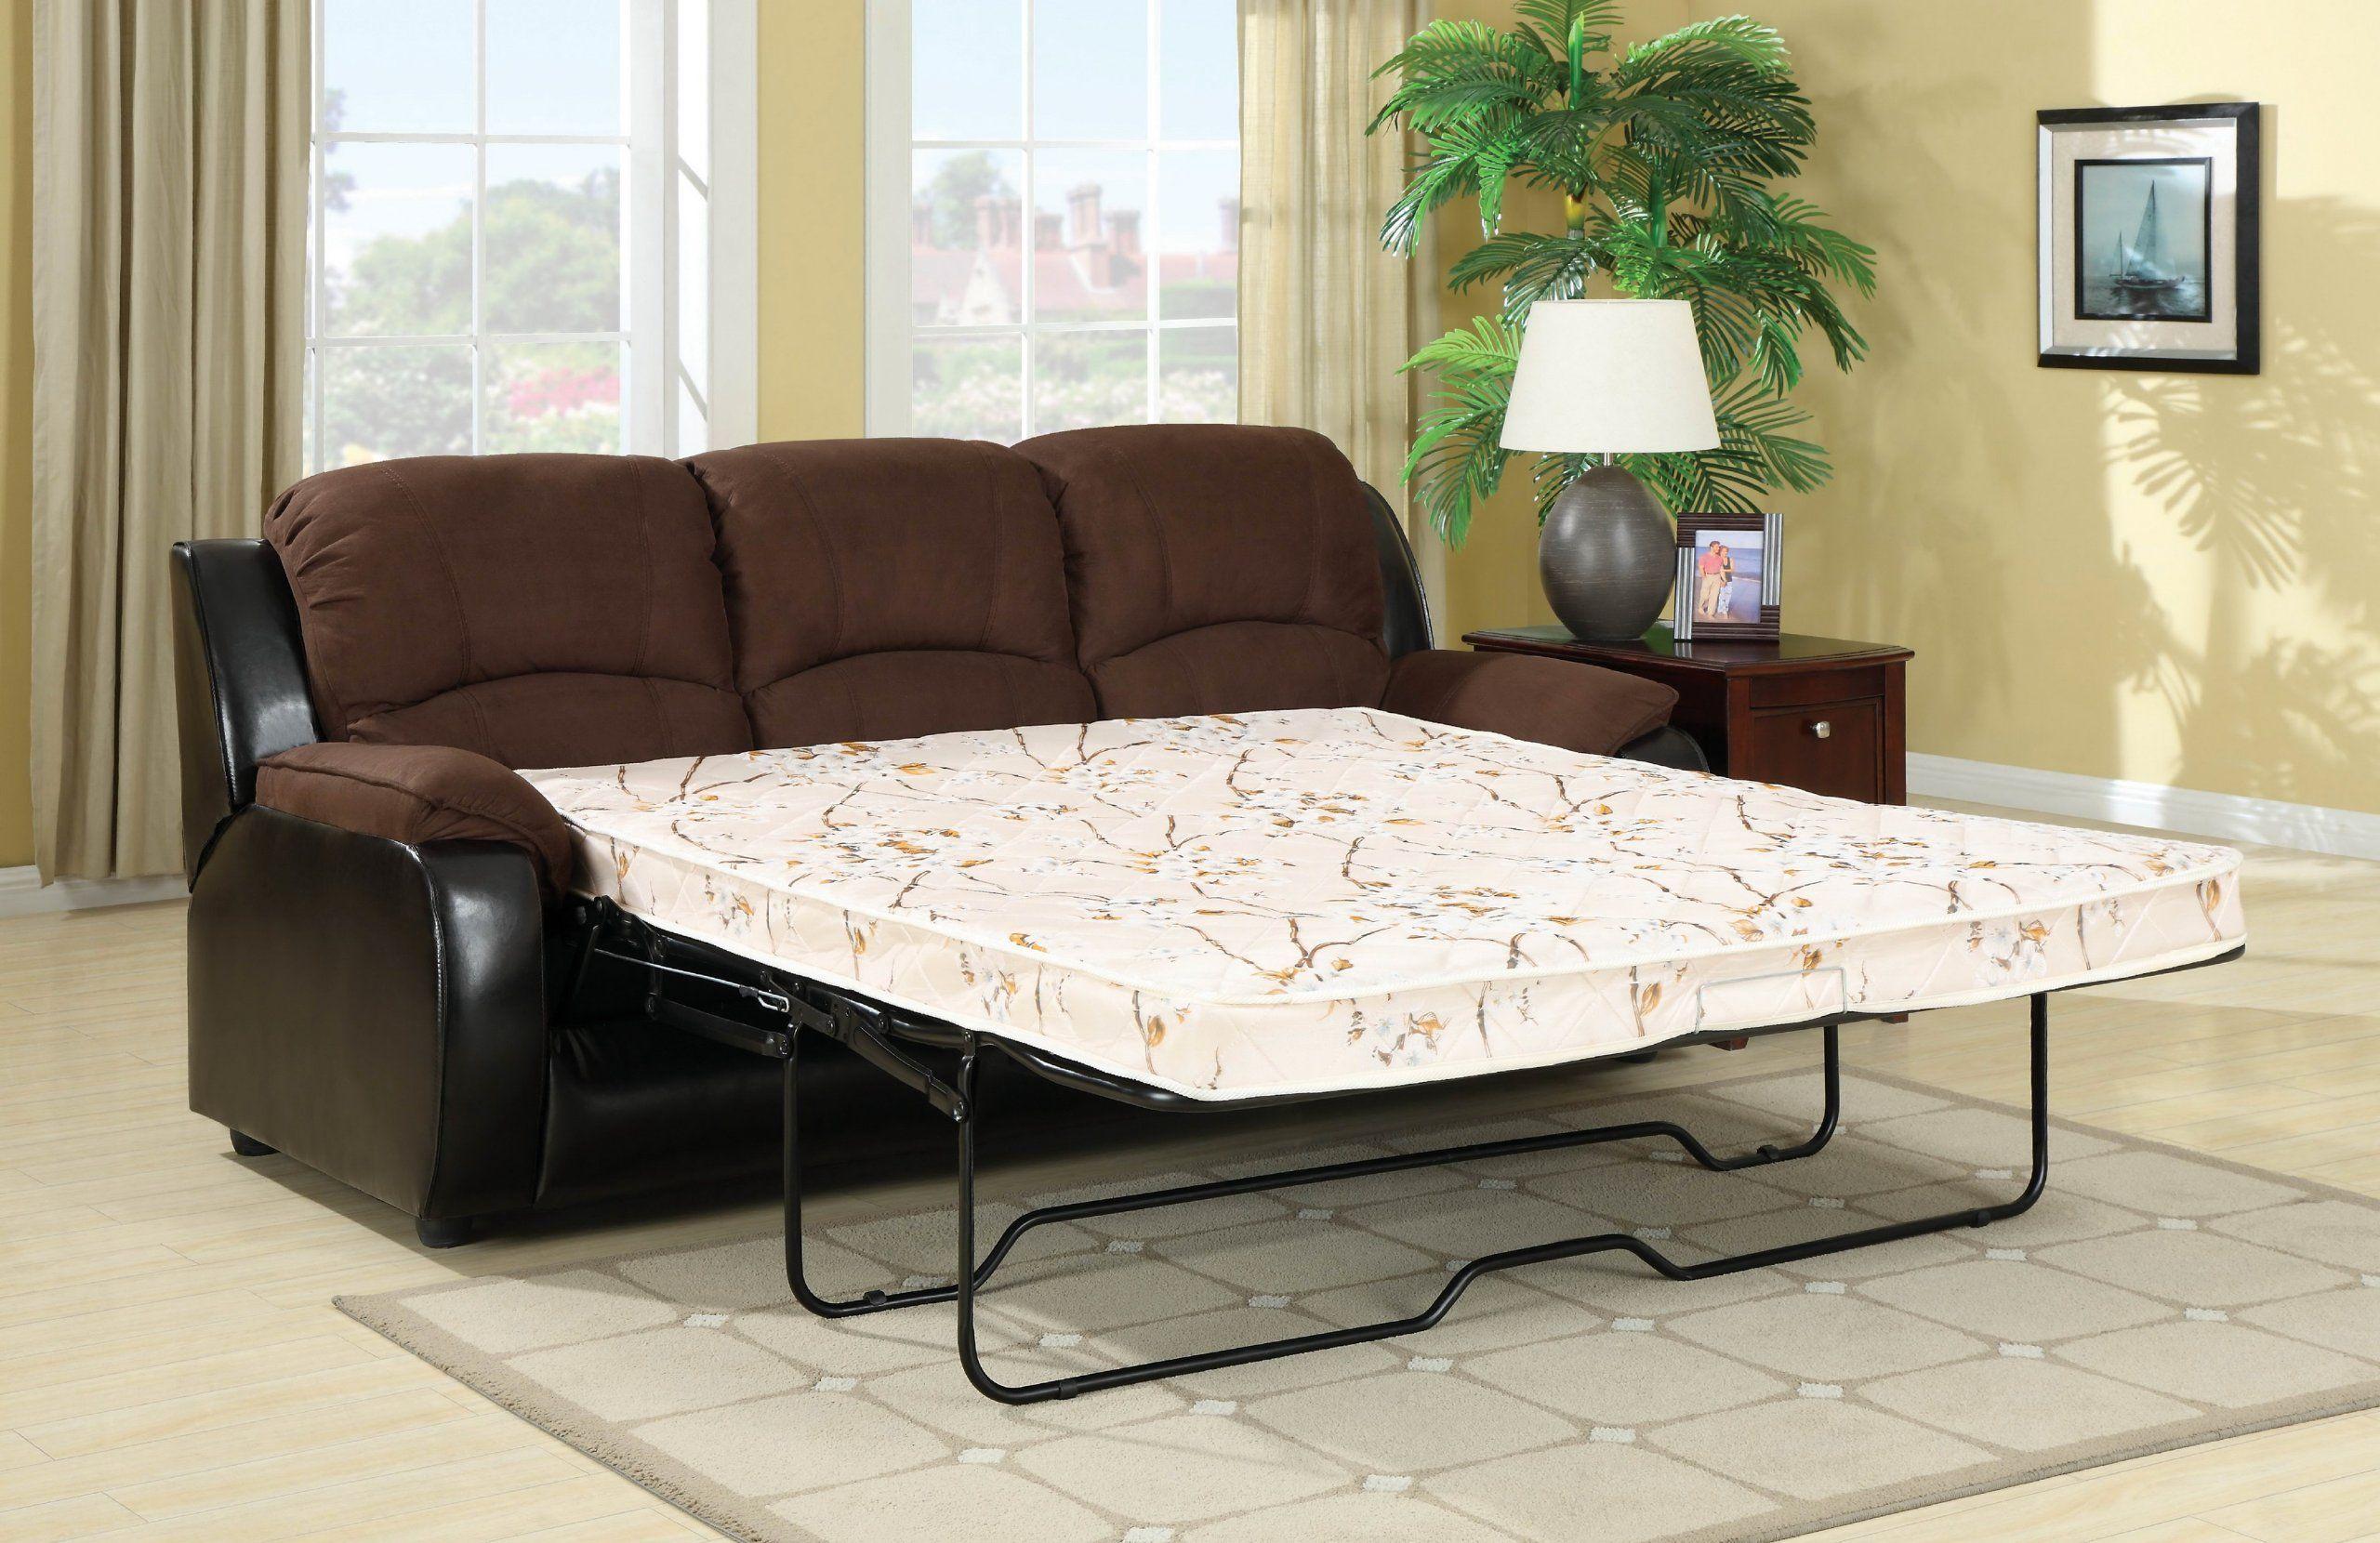 Furniture of America Adam Microfiber Sleeper Sofa Brown